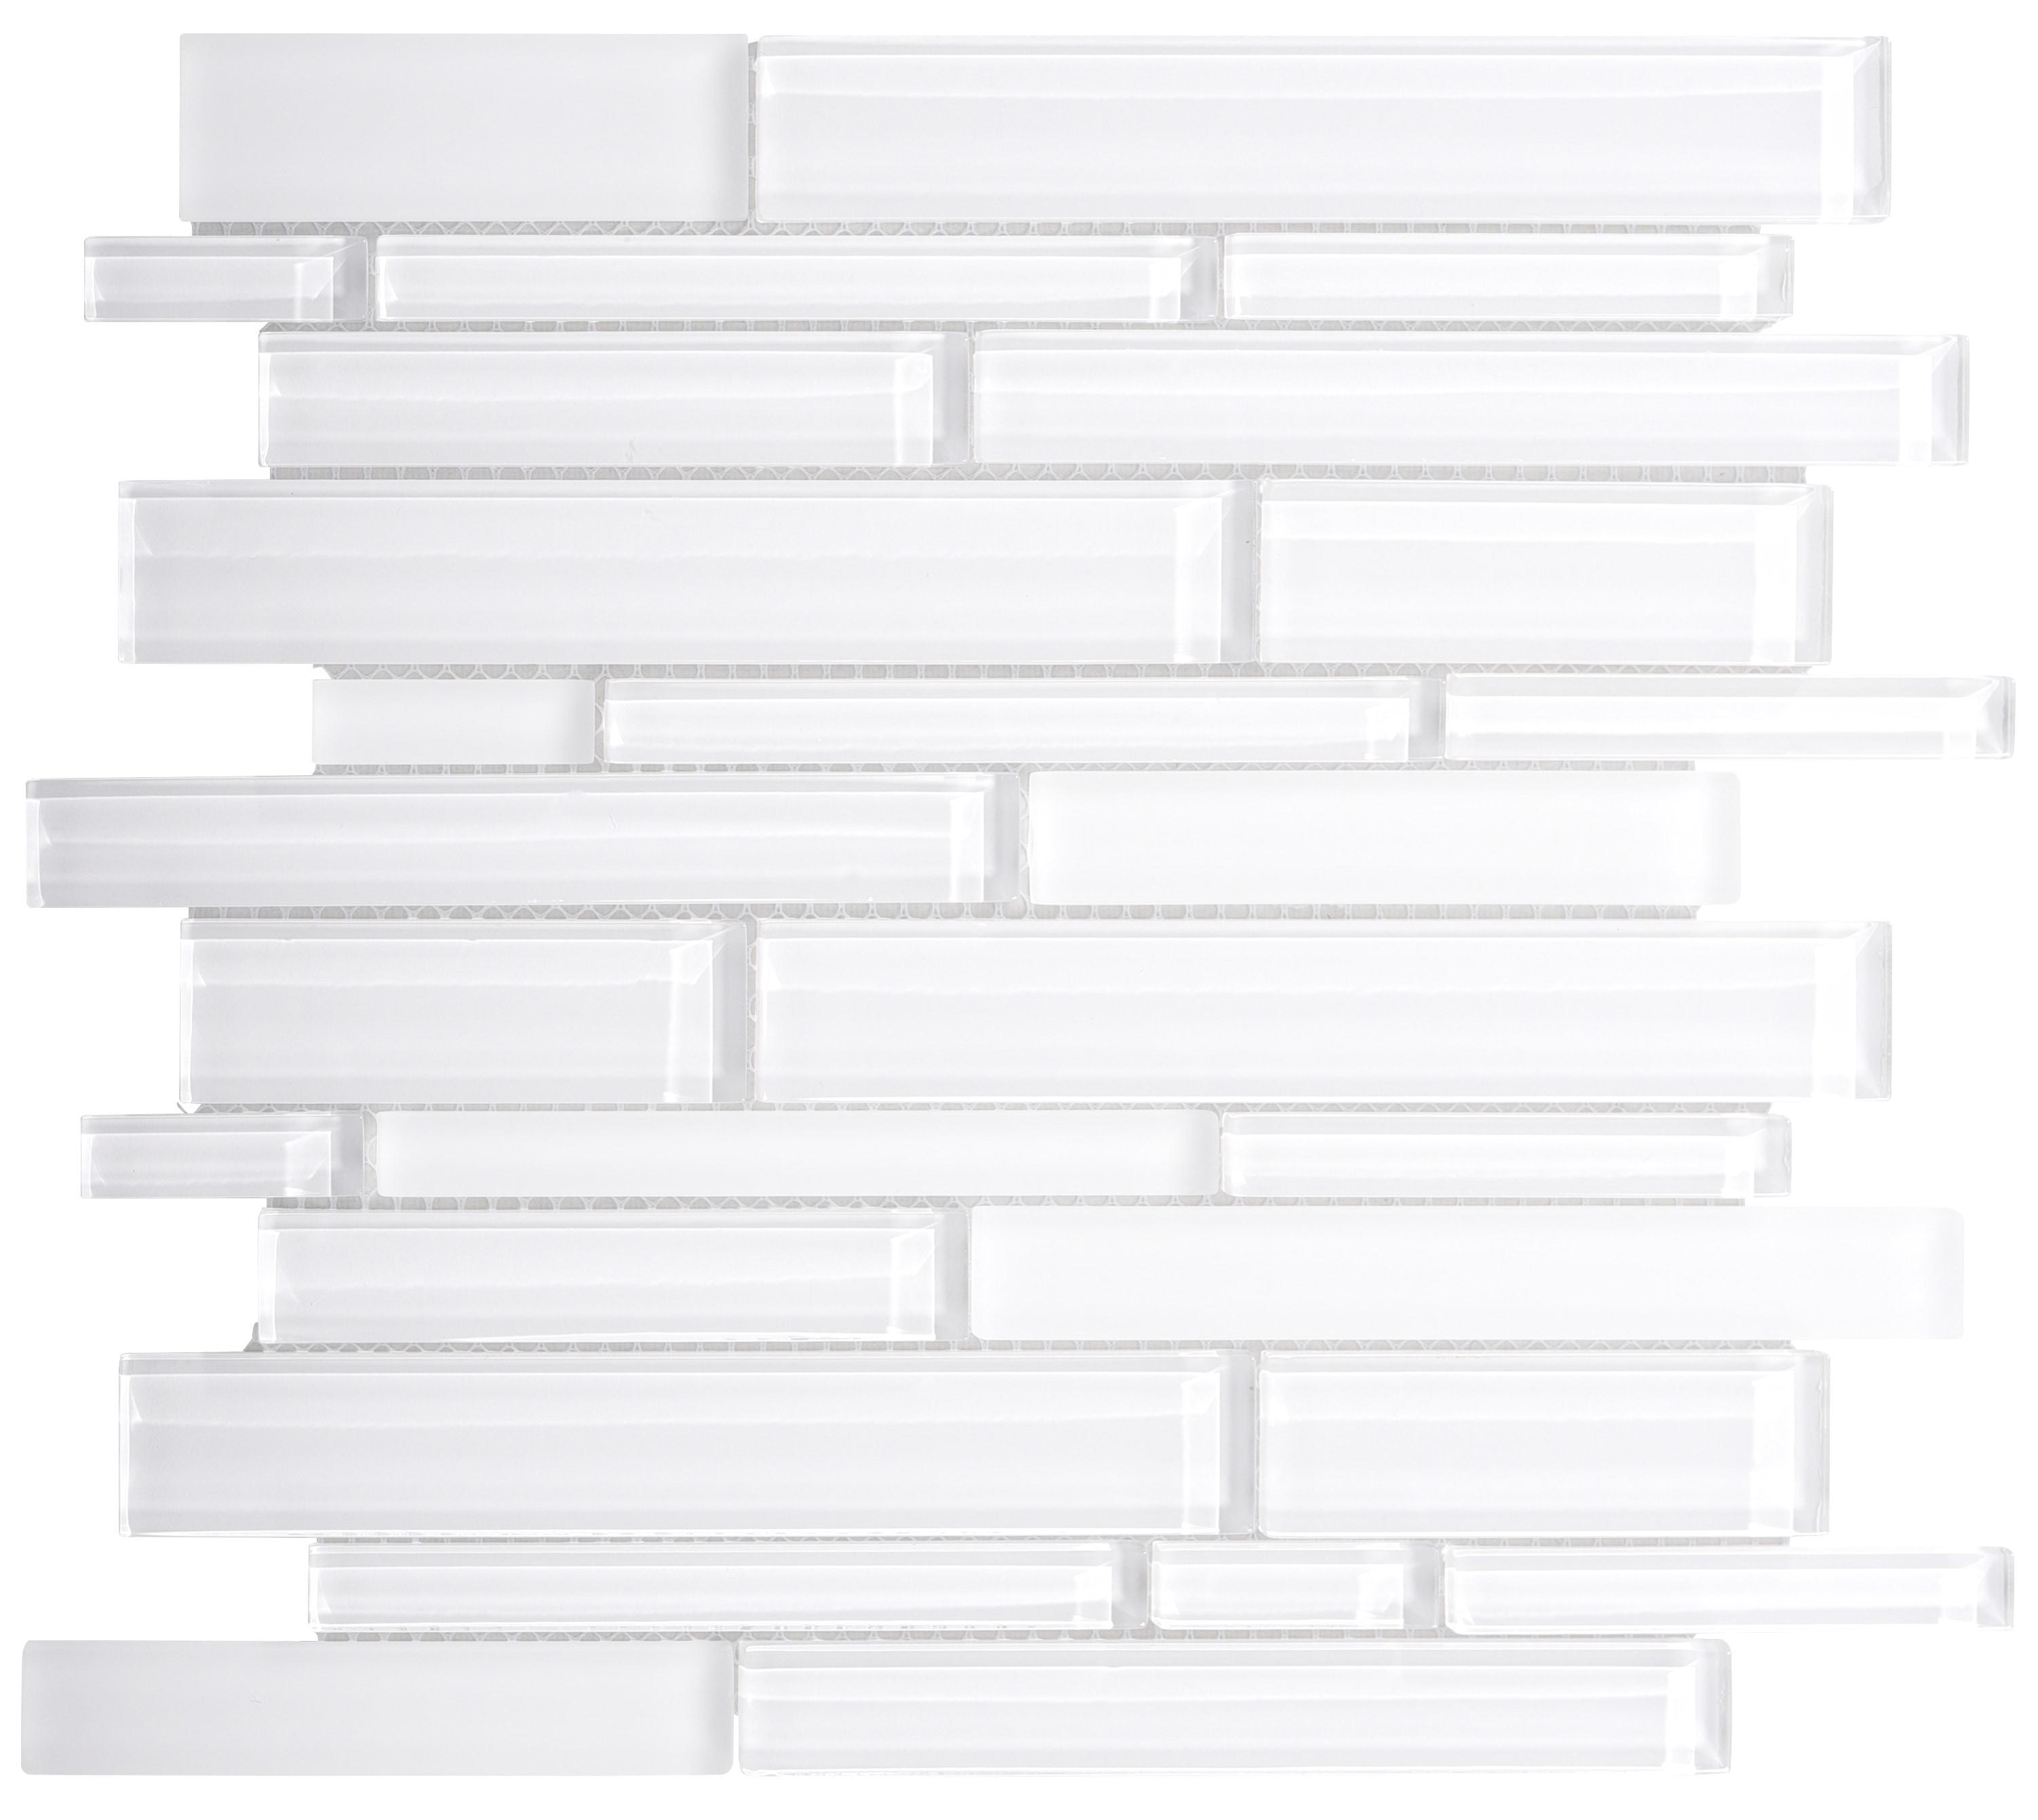 Glass Mosaic / 14 x 12 x 0.31 inches / Glossy Interlocking Random Sized Glass Mosaic Tile In White 0